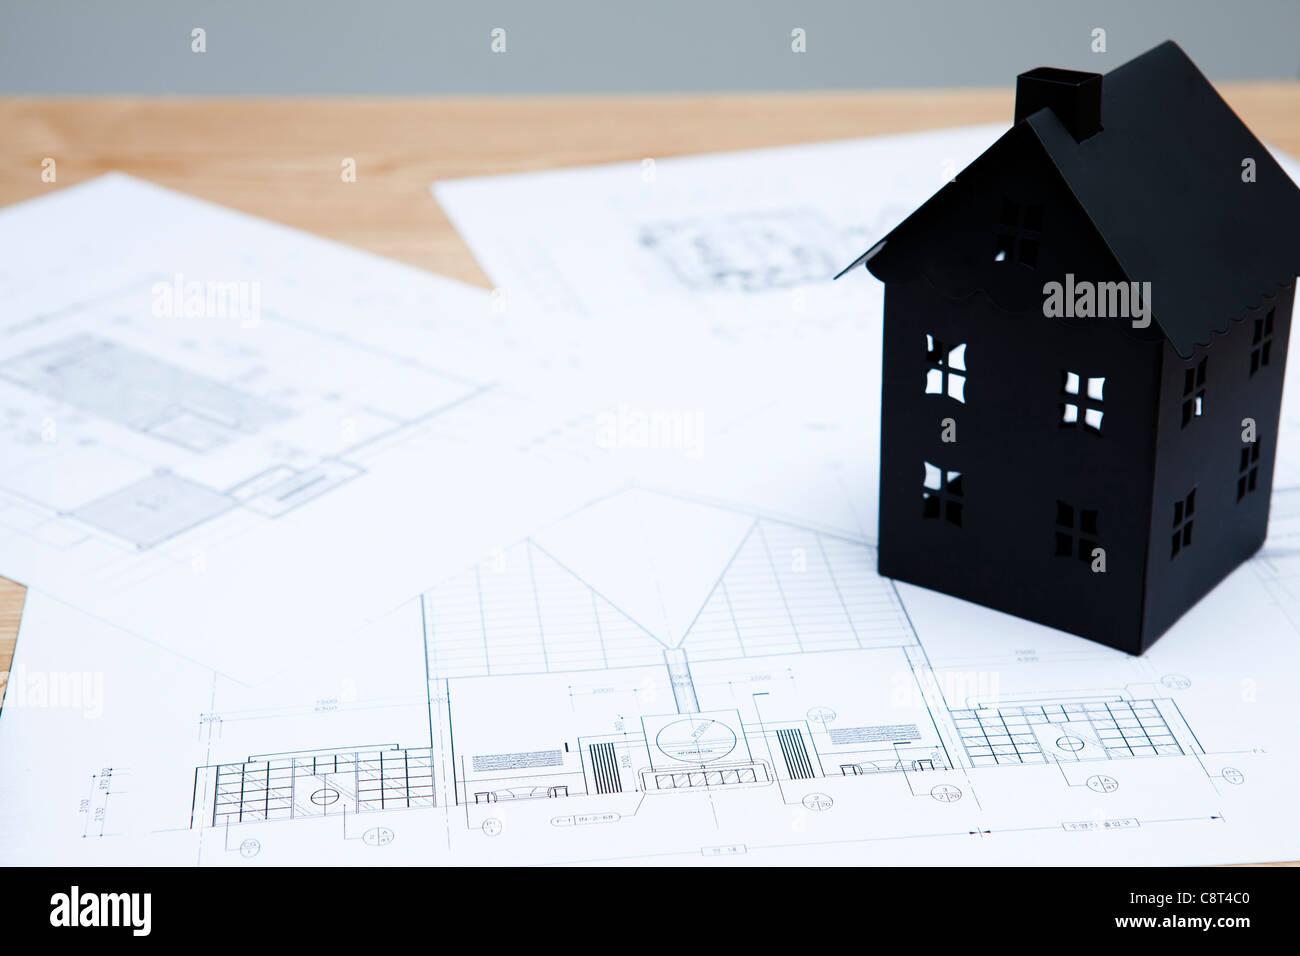 Model home diagram stock photos model home diagram stock images house model with house diagram paper stock image ccuart Gallery